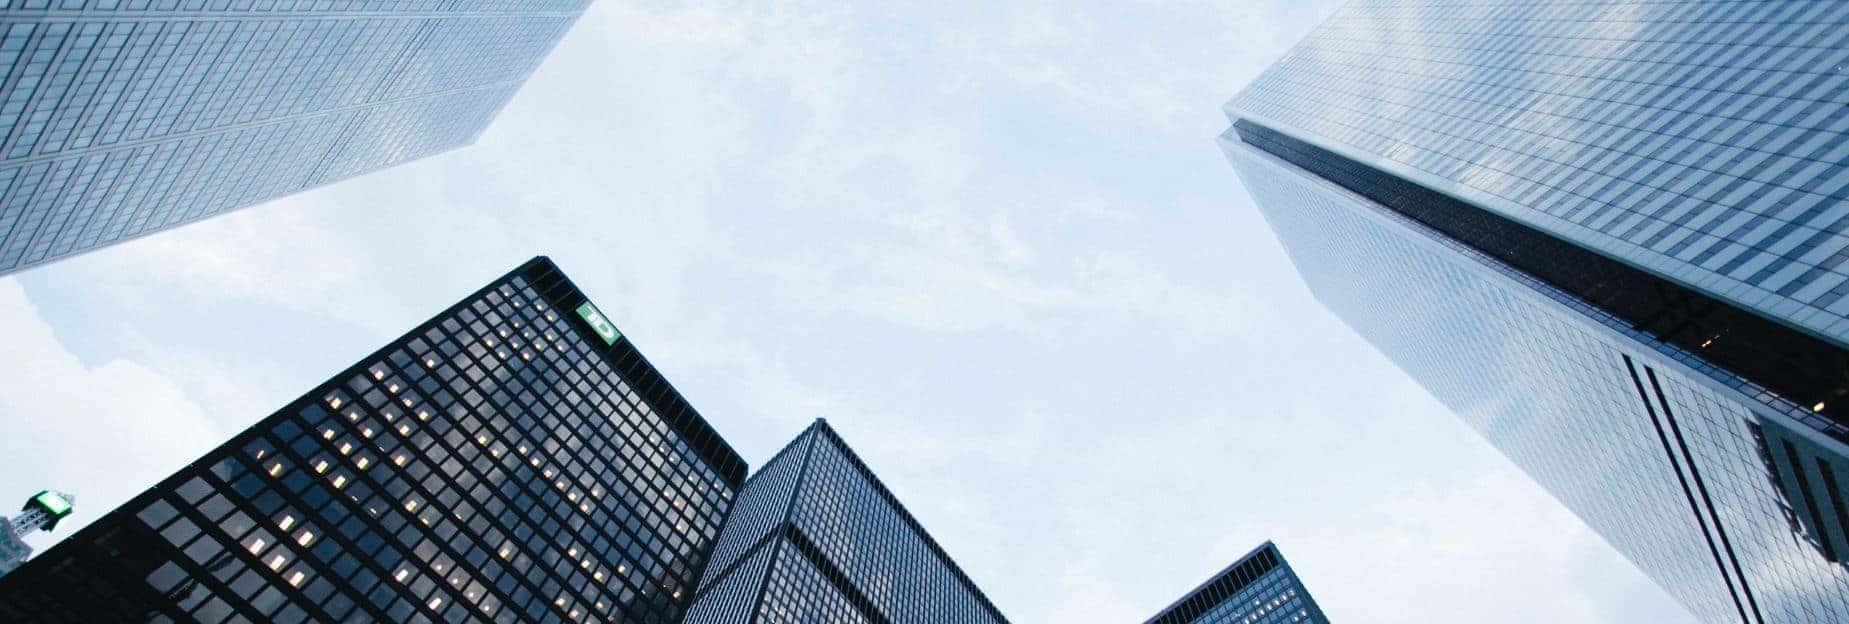 Ankaufprofil Assetklasse Immobilien Investoren DE